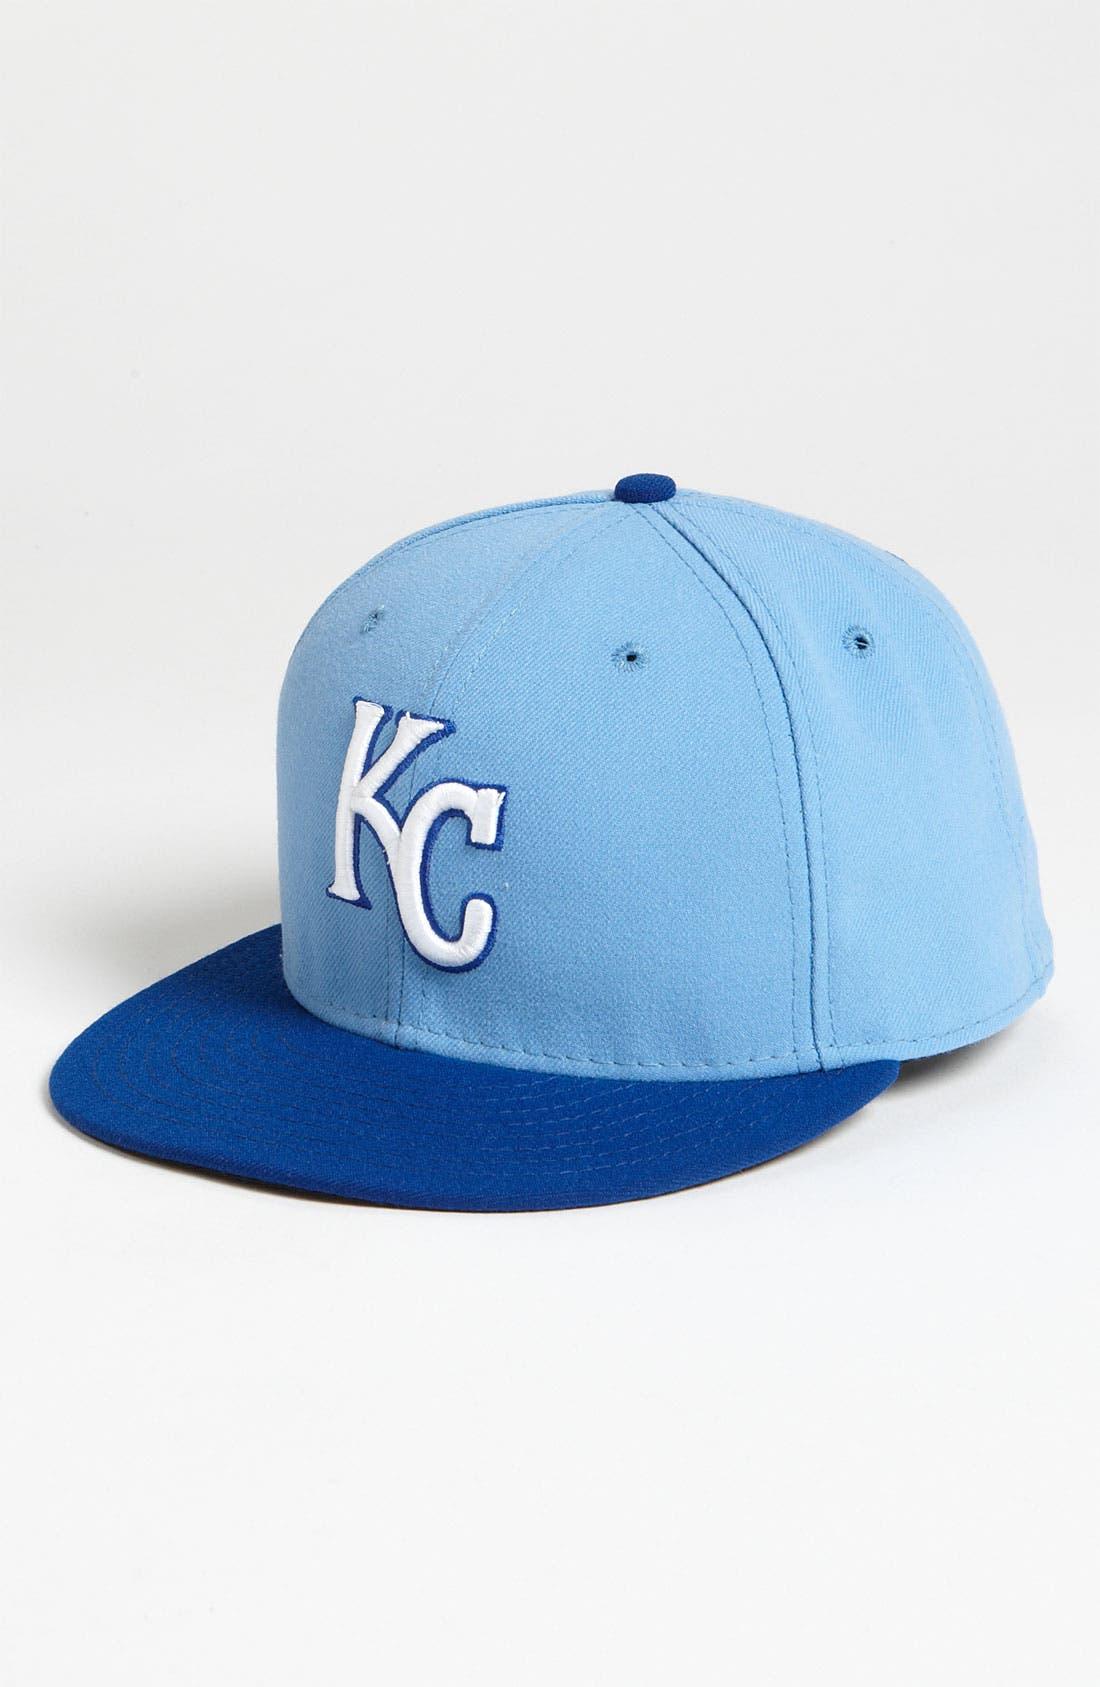 Main Image - New Era Cap 'Kansas City Royals' Baseball Cap